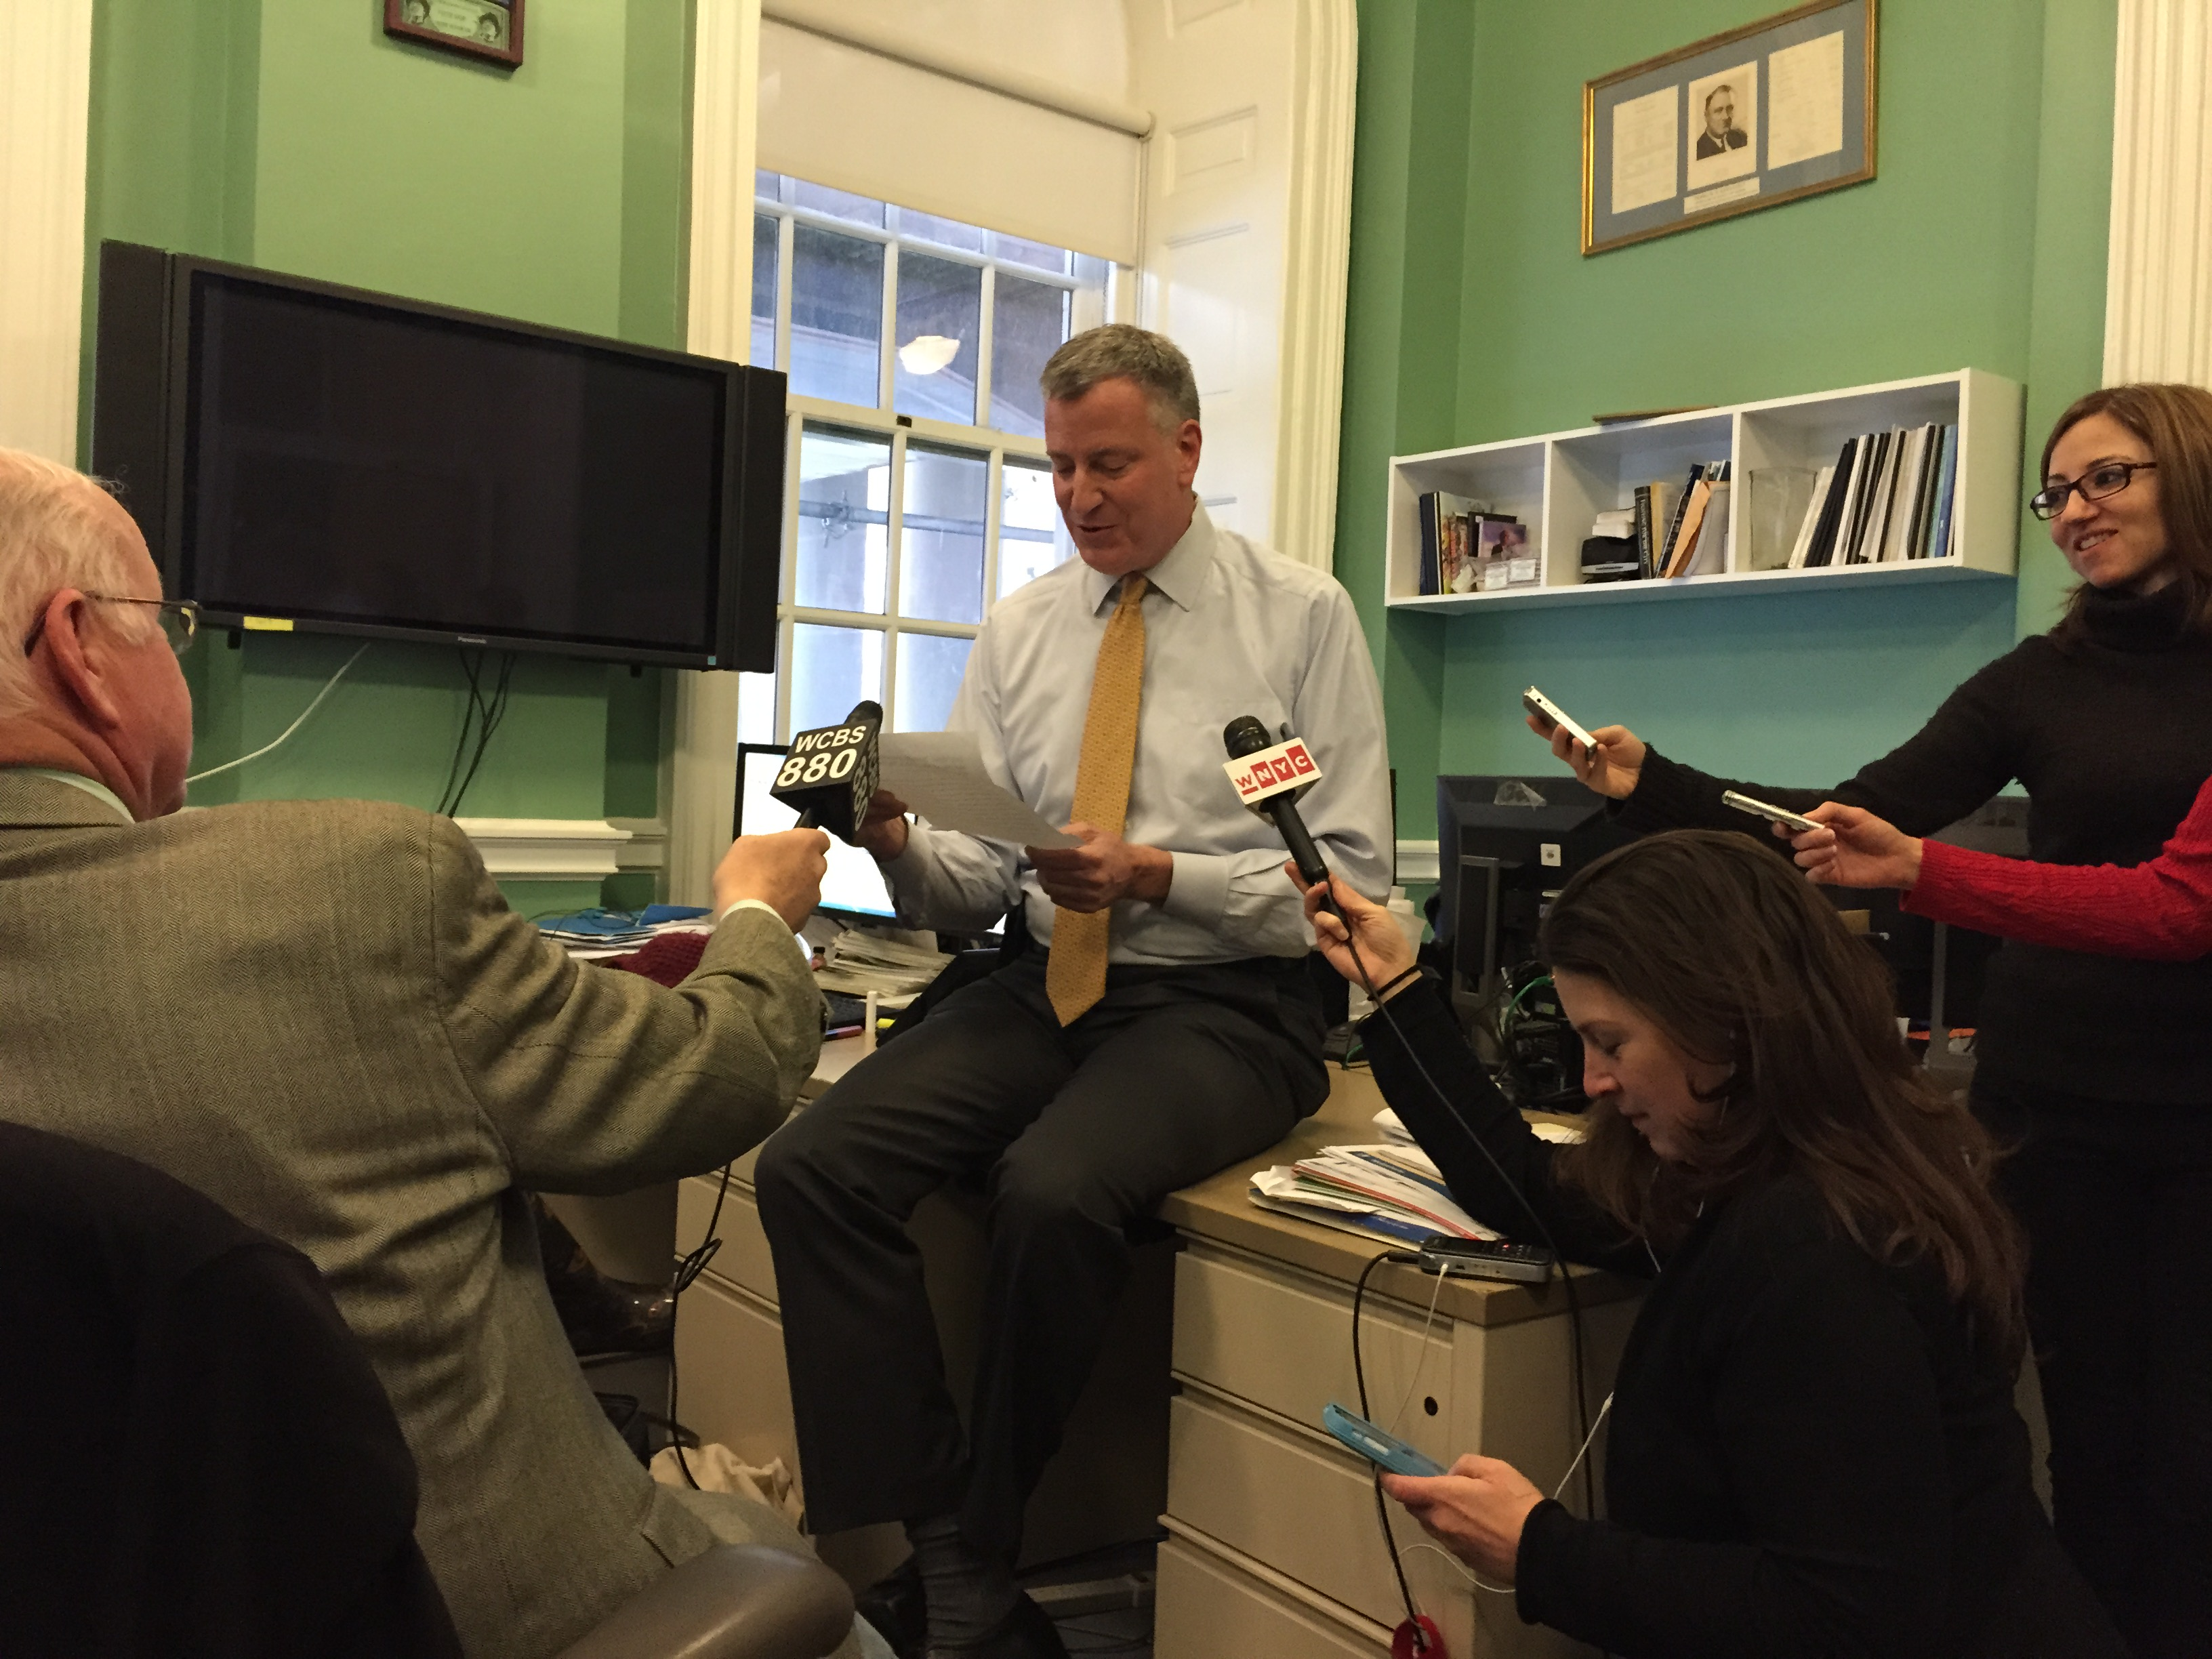 Mayor Bill de Blasio reads an Onion article aloud. (Photo: Jillian Jorgensen/New York Observer)